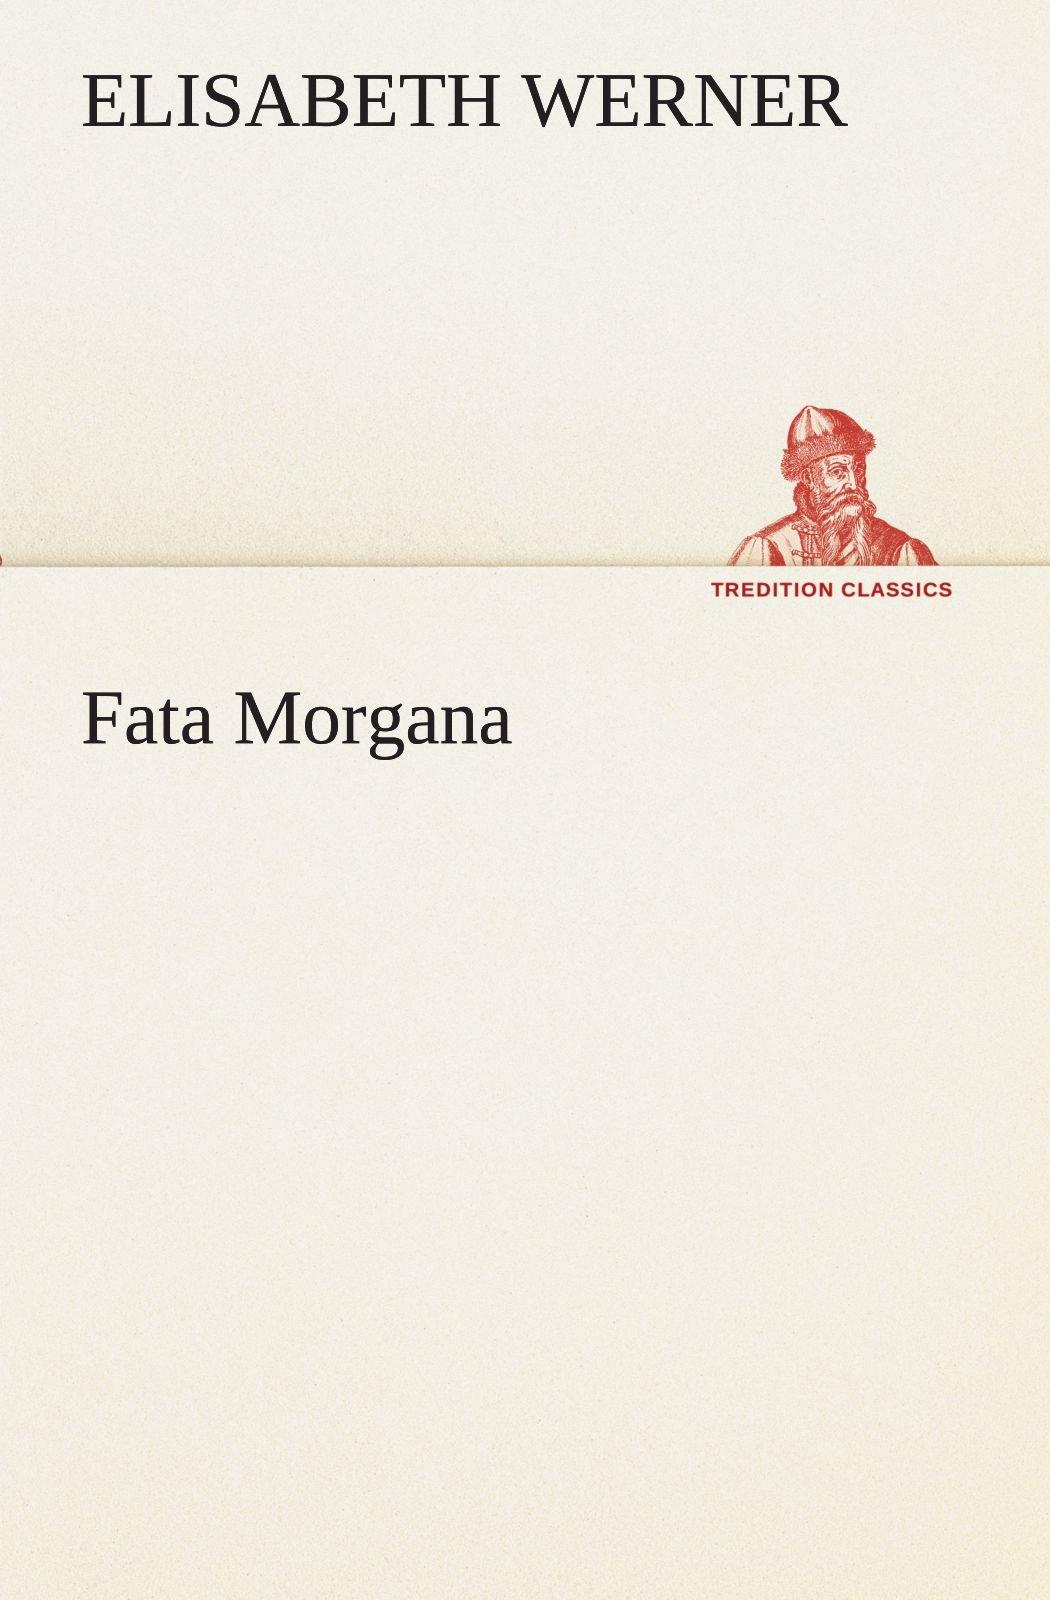 Download Fata Morgana (TREDITION CLASSICS) (German Edition) pdf